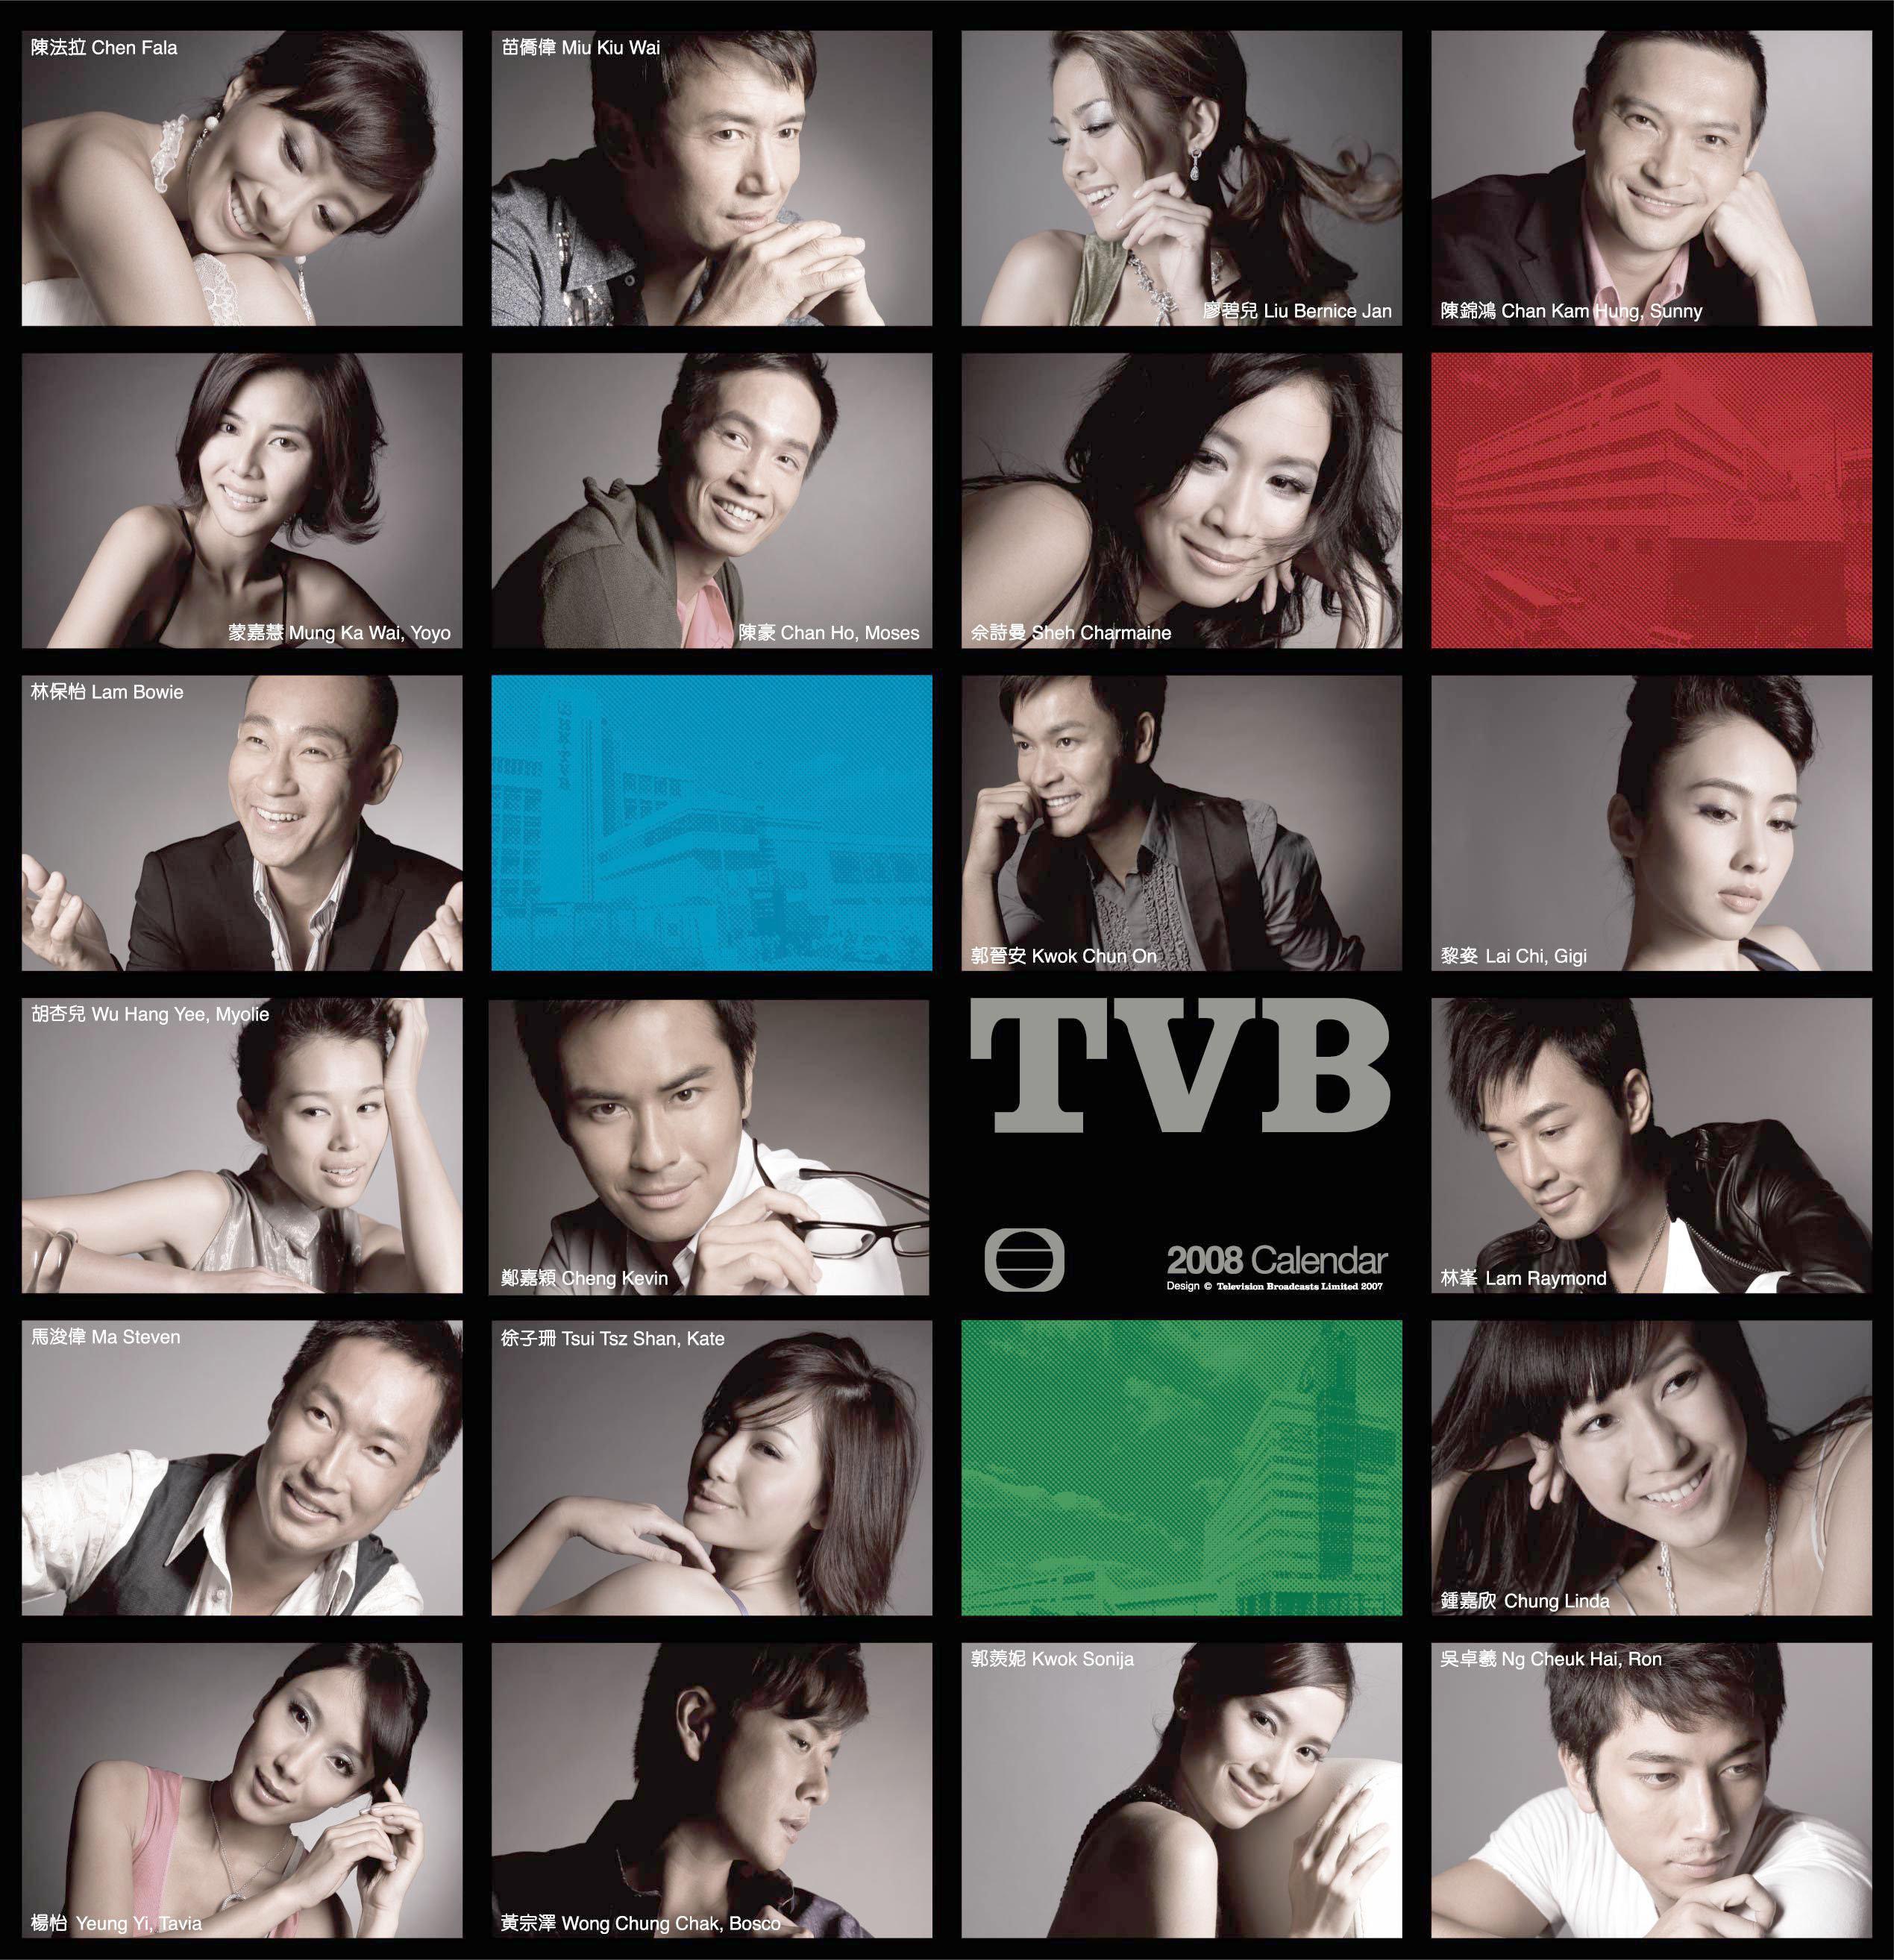 Hong Kong TVB calendar 2008 cover image